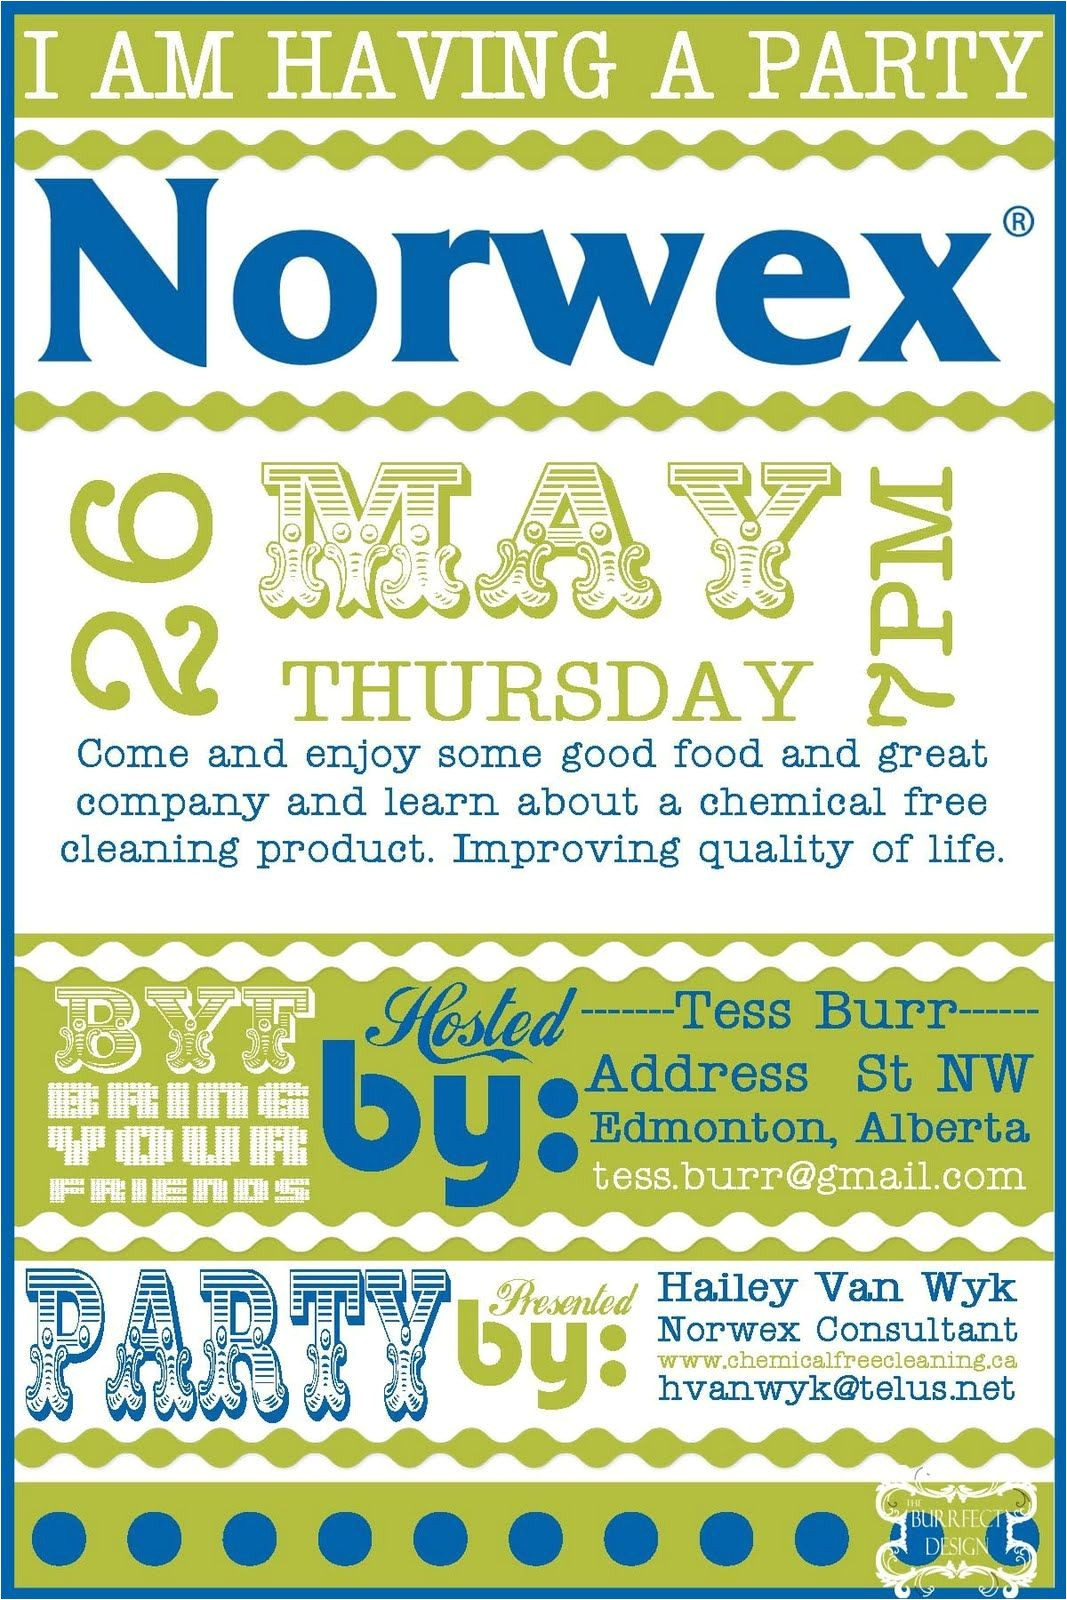 Norwex Launch Party Invitations Burrfect Design norwex Party Invite